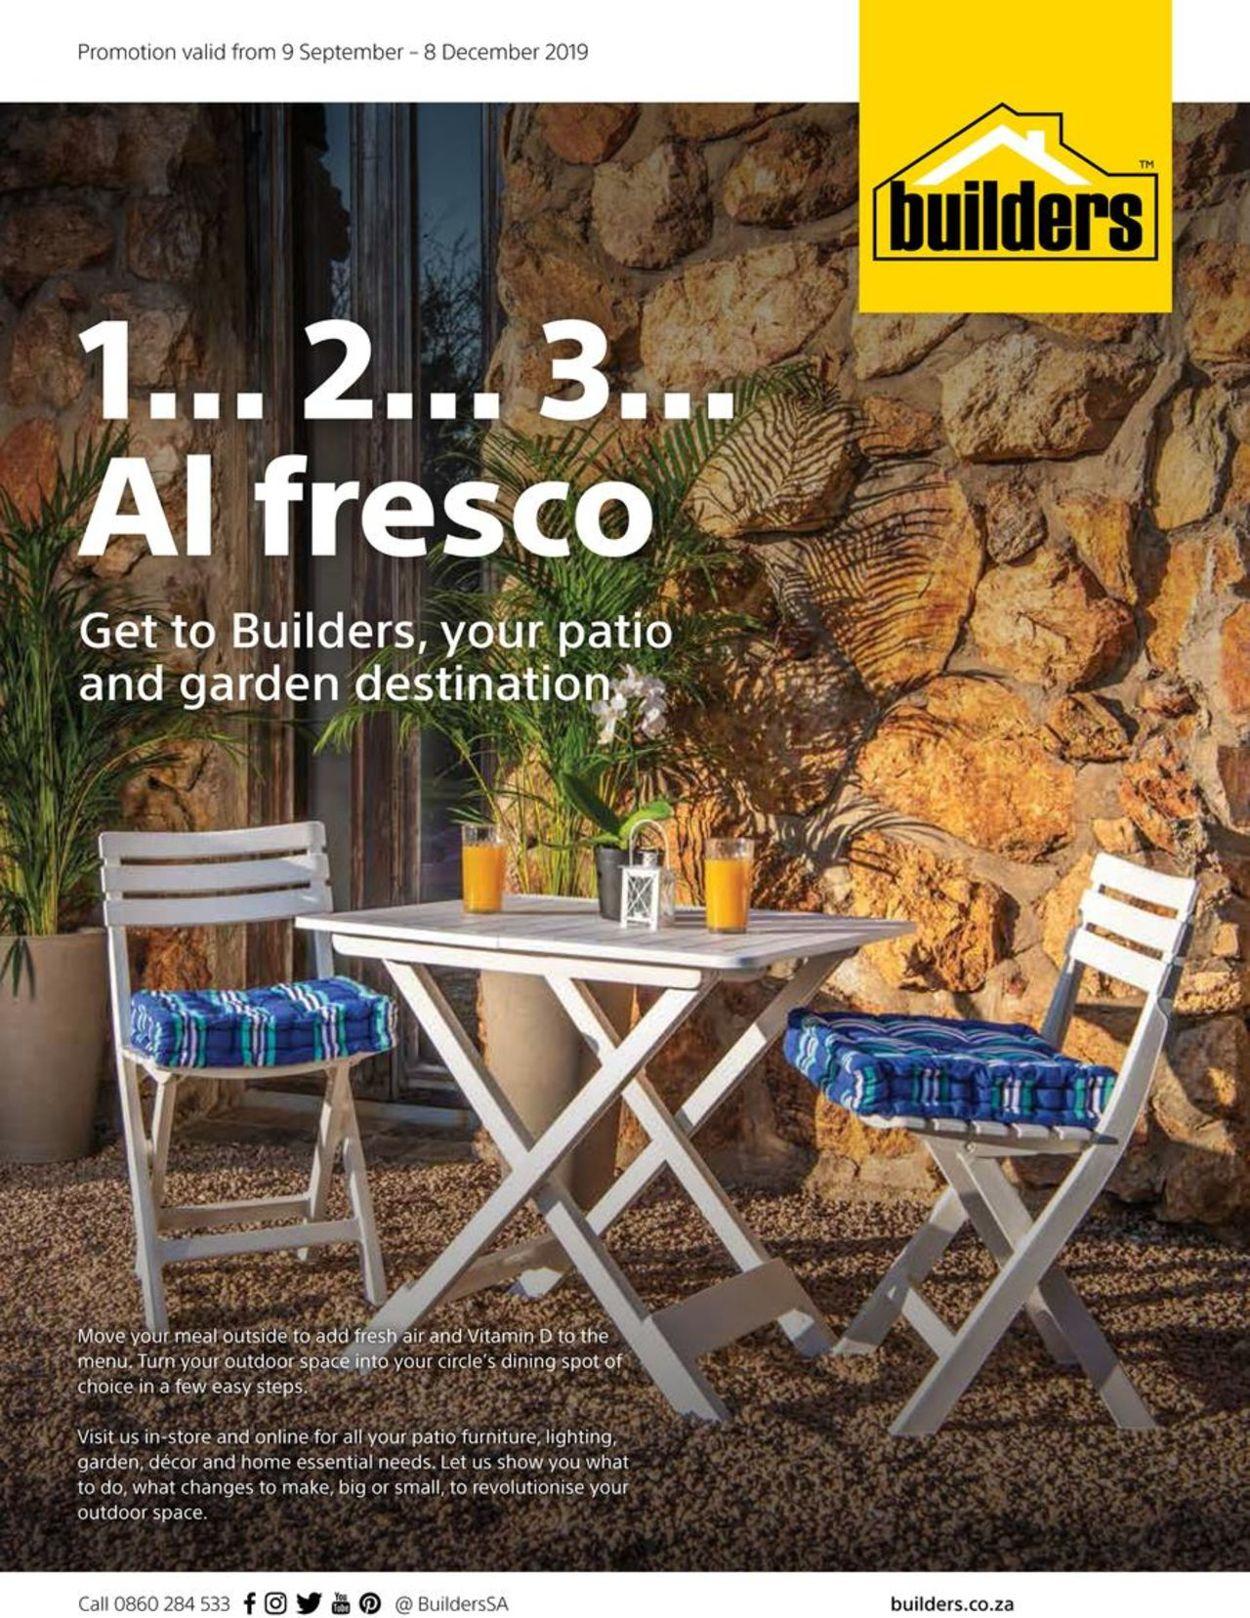 Builders Warehouse Catalogue - 2019/09/09-2019/12/08